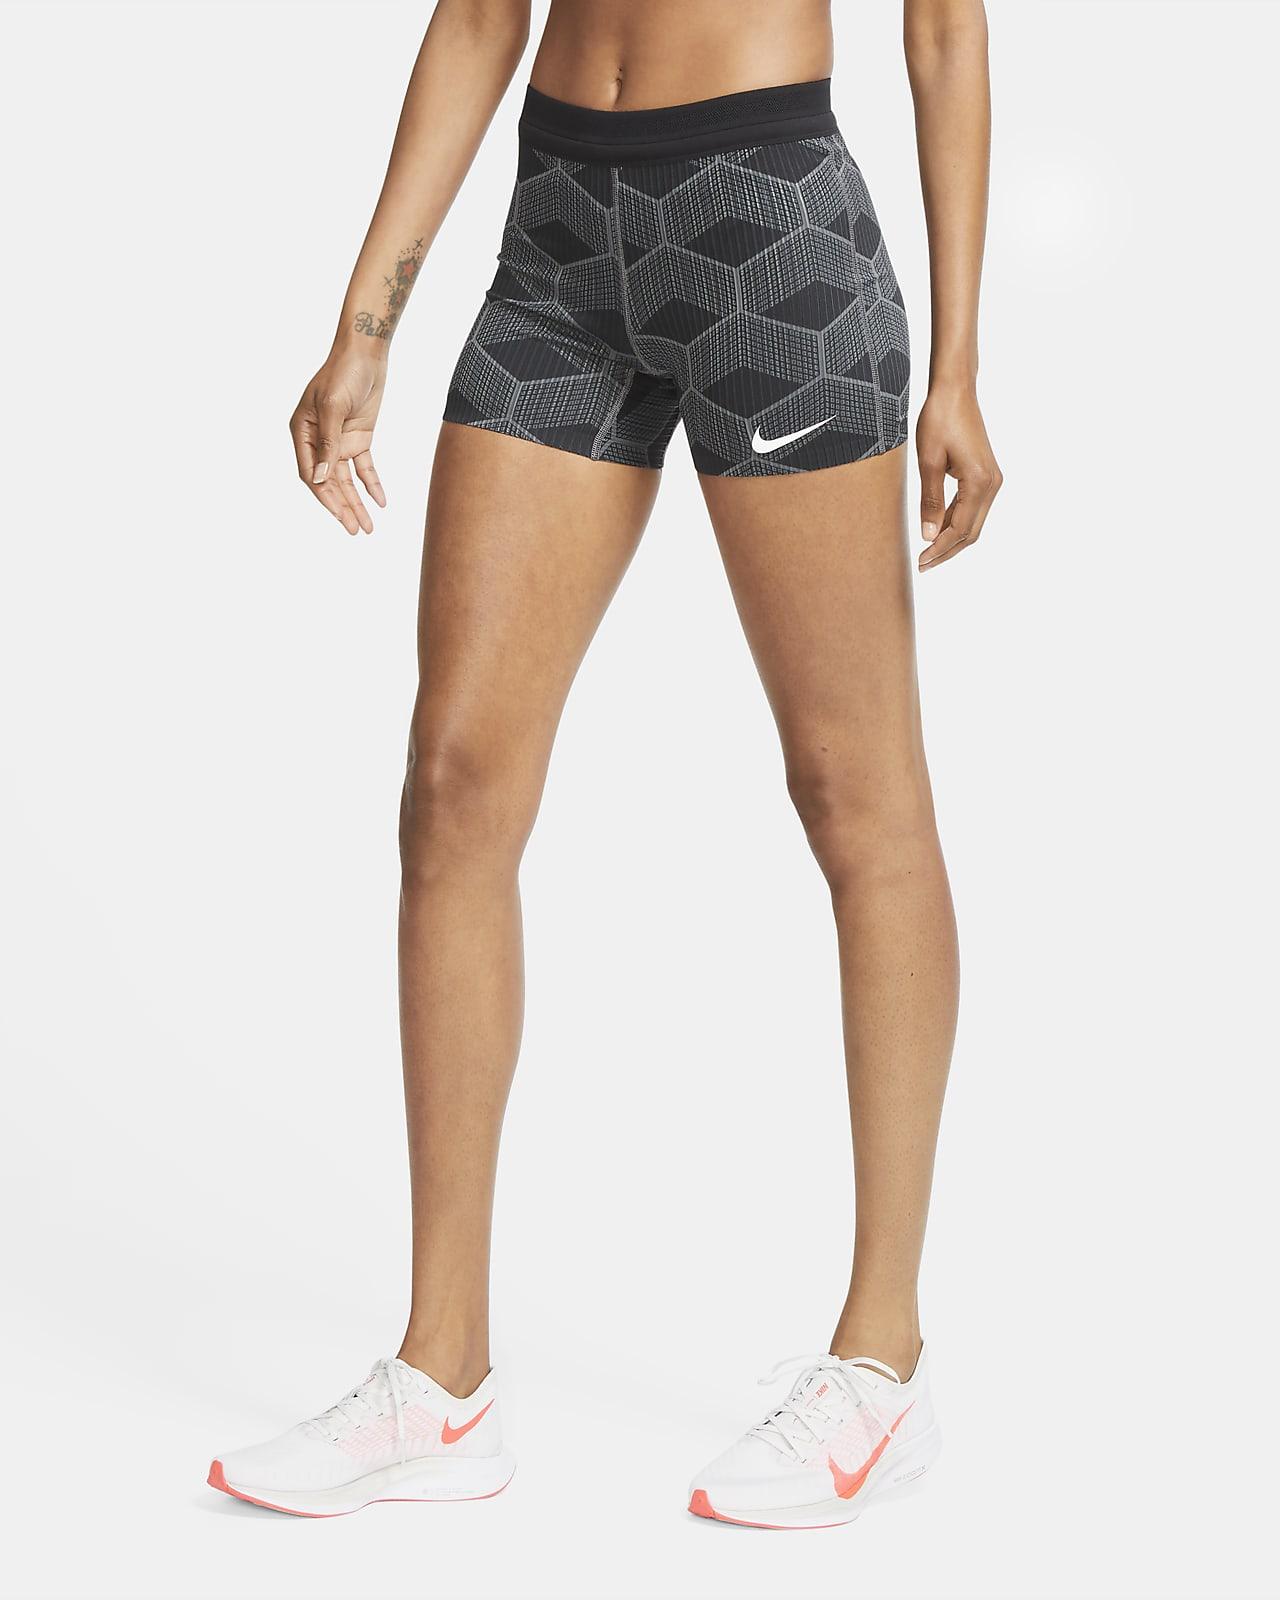 Short de running ajusté Nike Dri-FIT ADV Team Kenya AeroSwift pour Femme